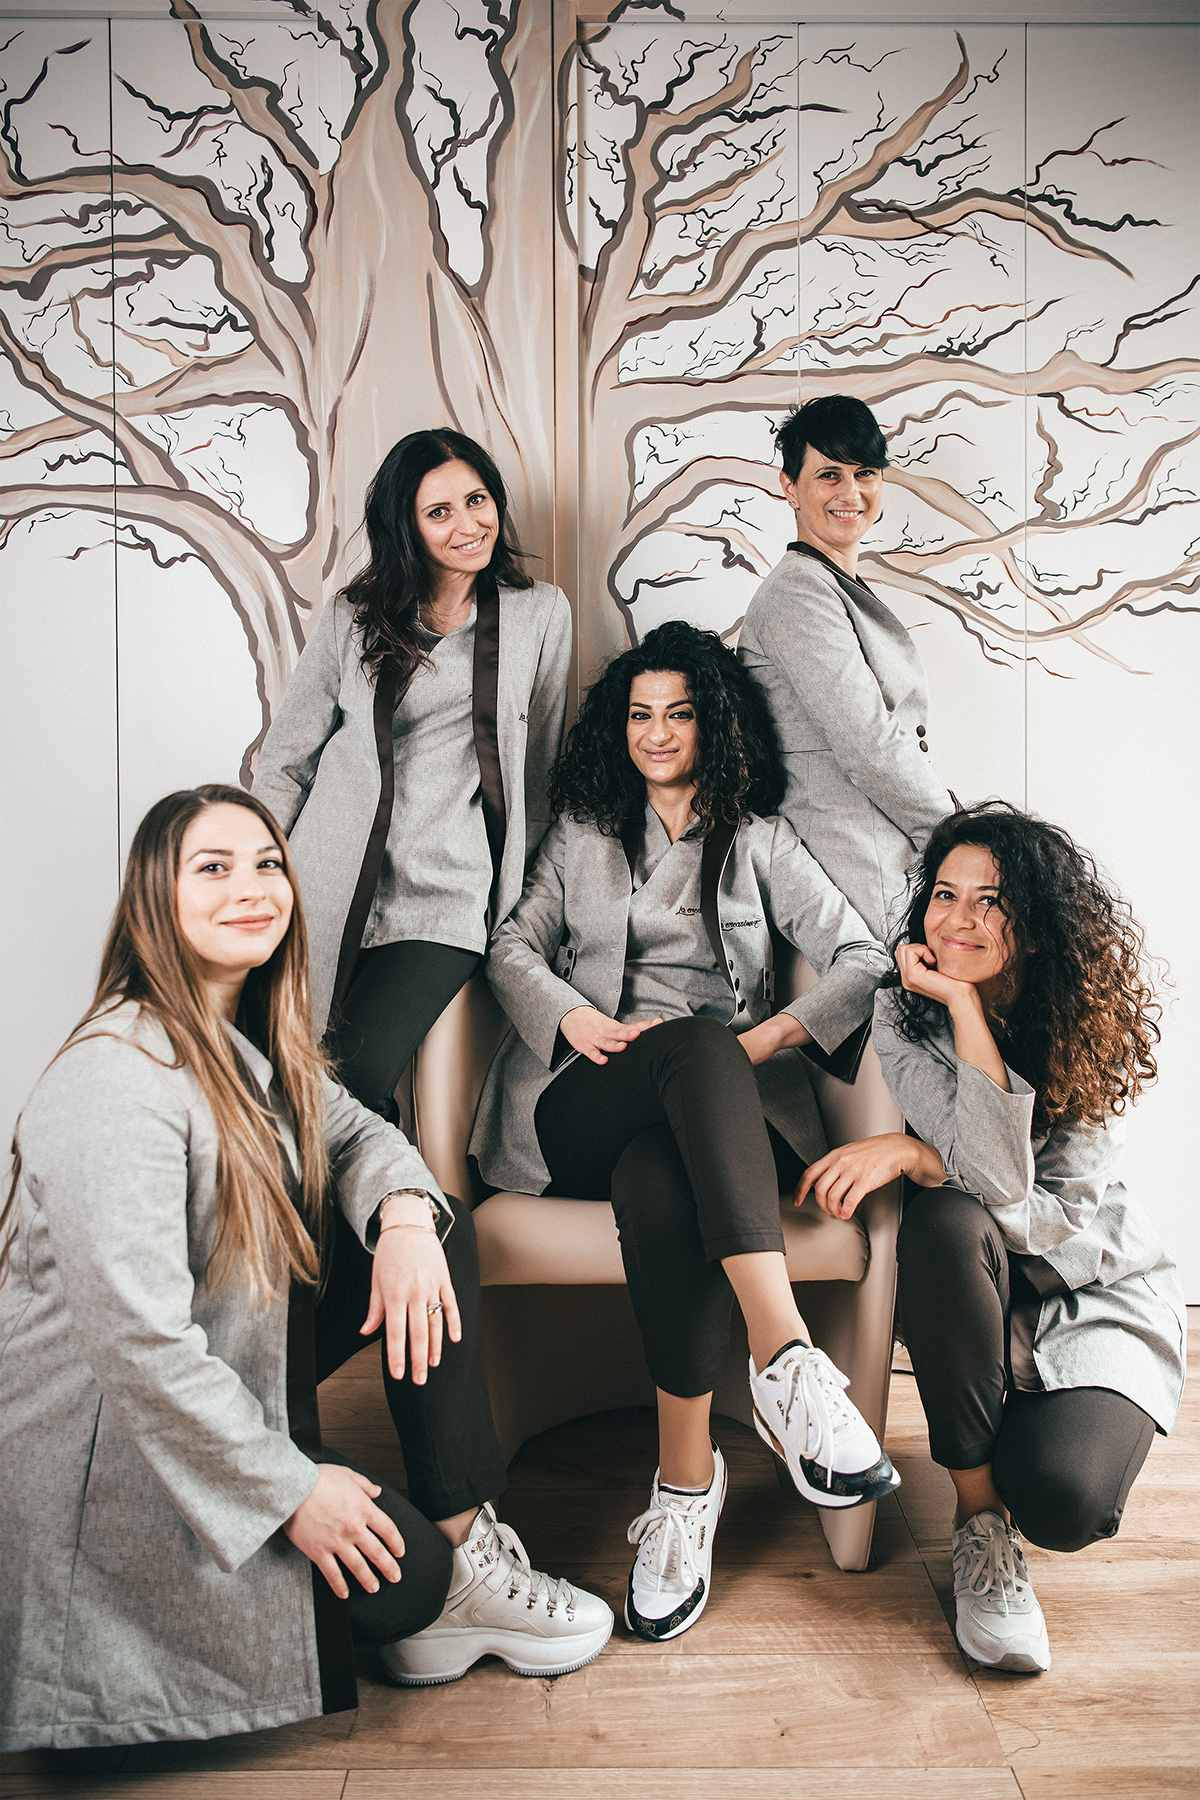 Team La Creazione di Laura Cavarischia